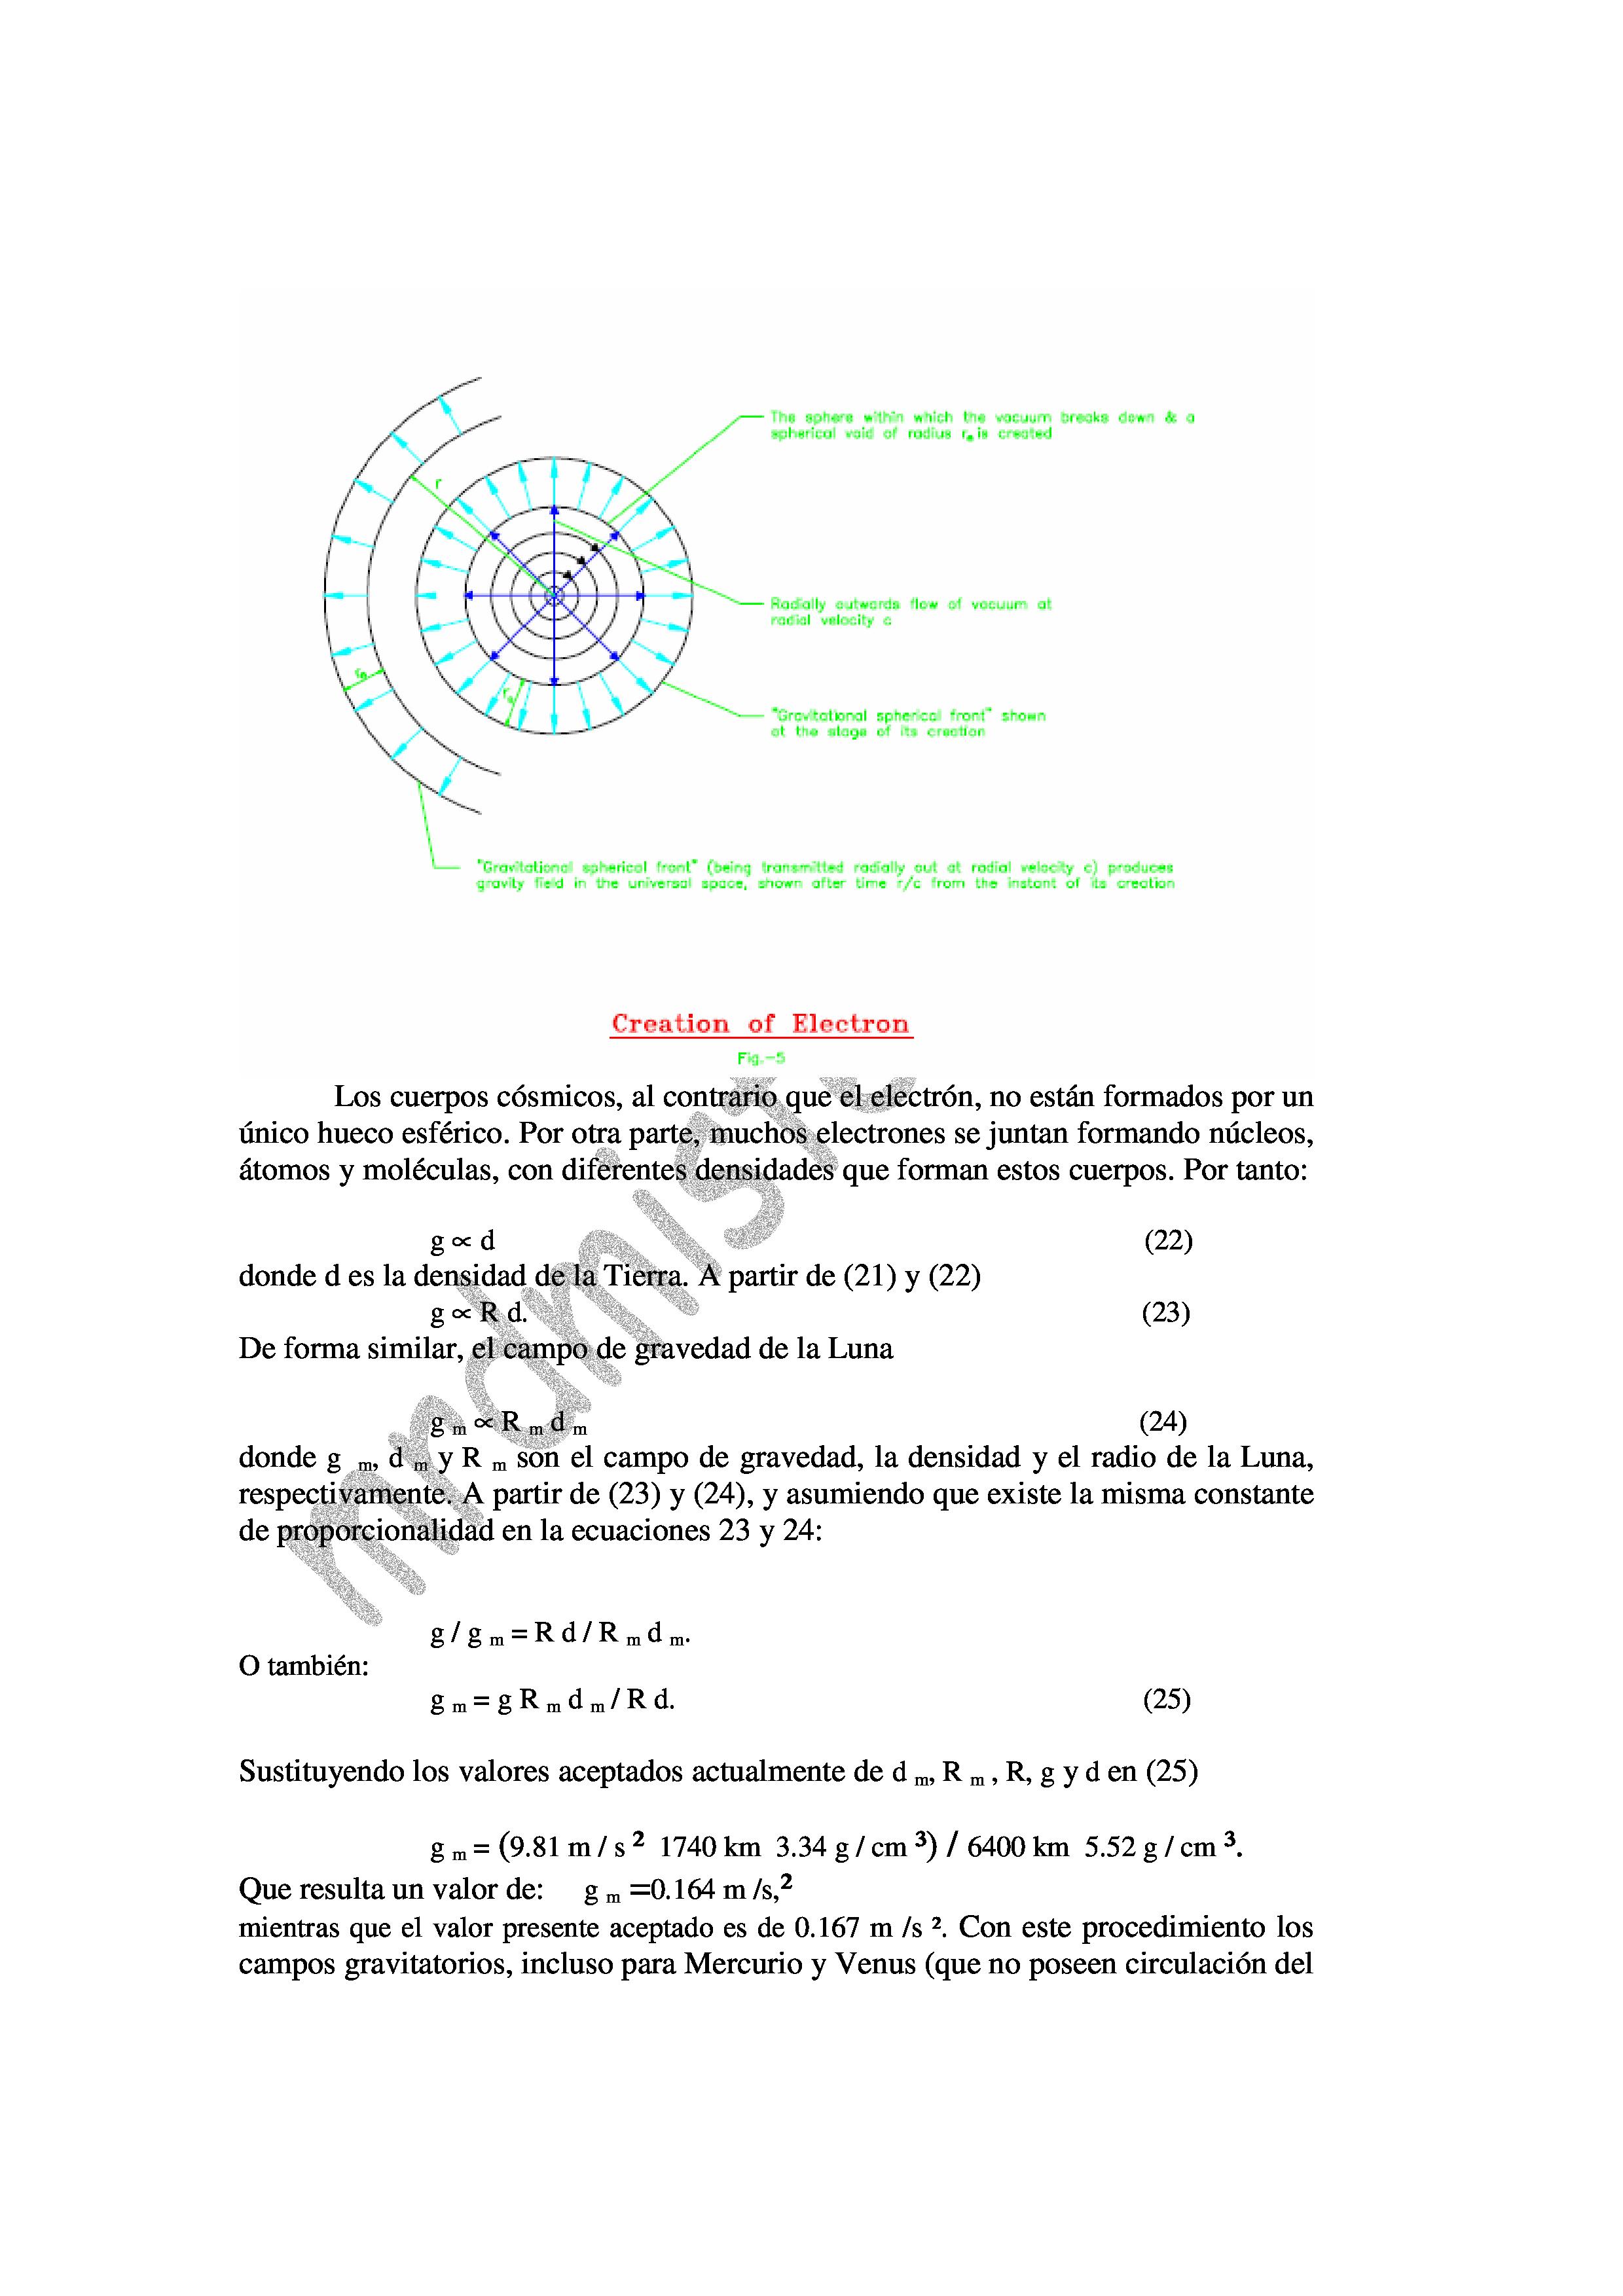 Documento2_Tewari_Espanol_con_dibujos-9